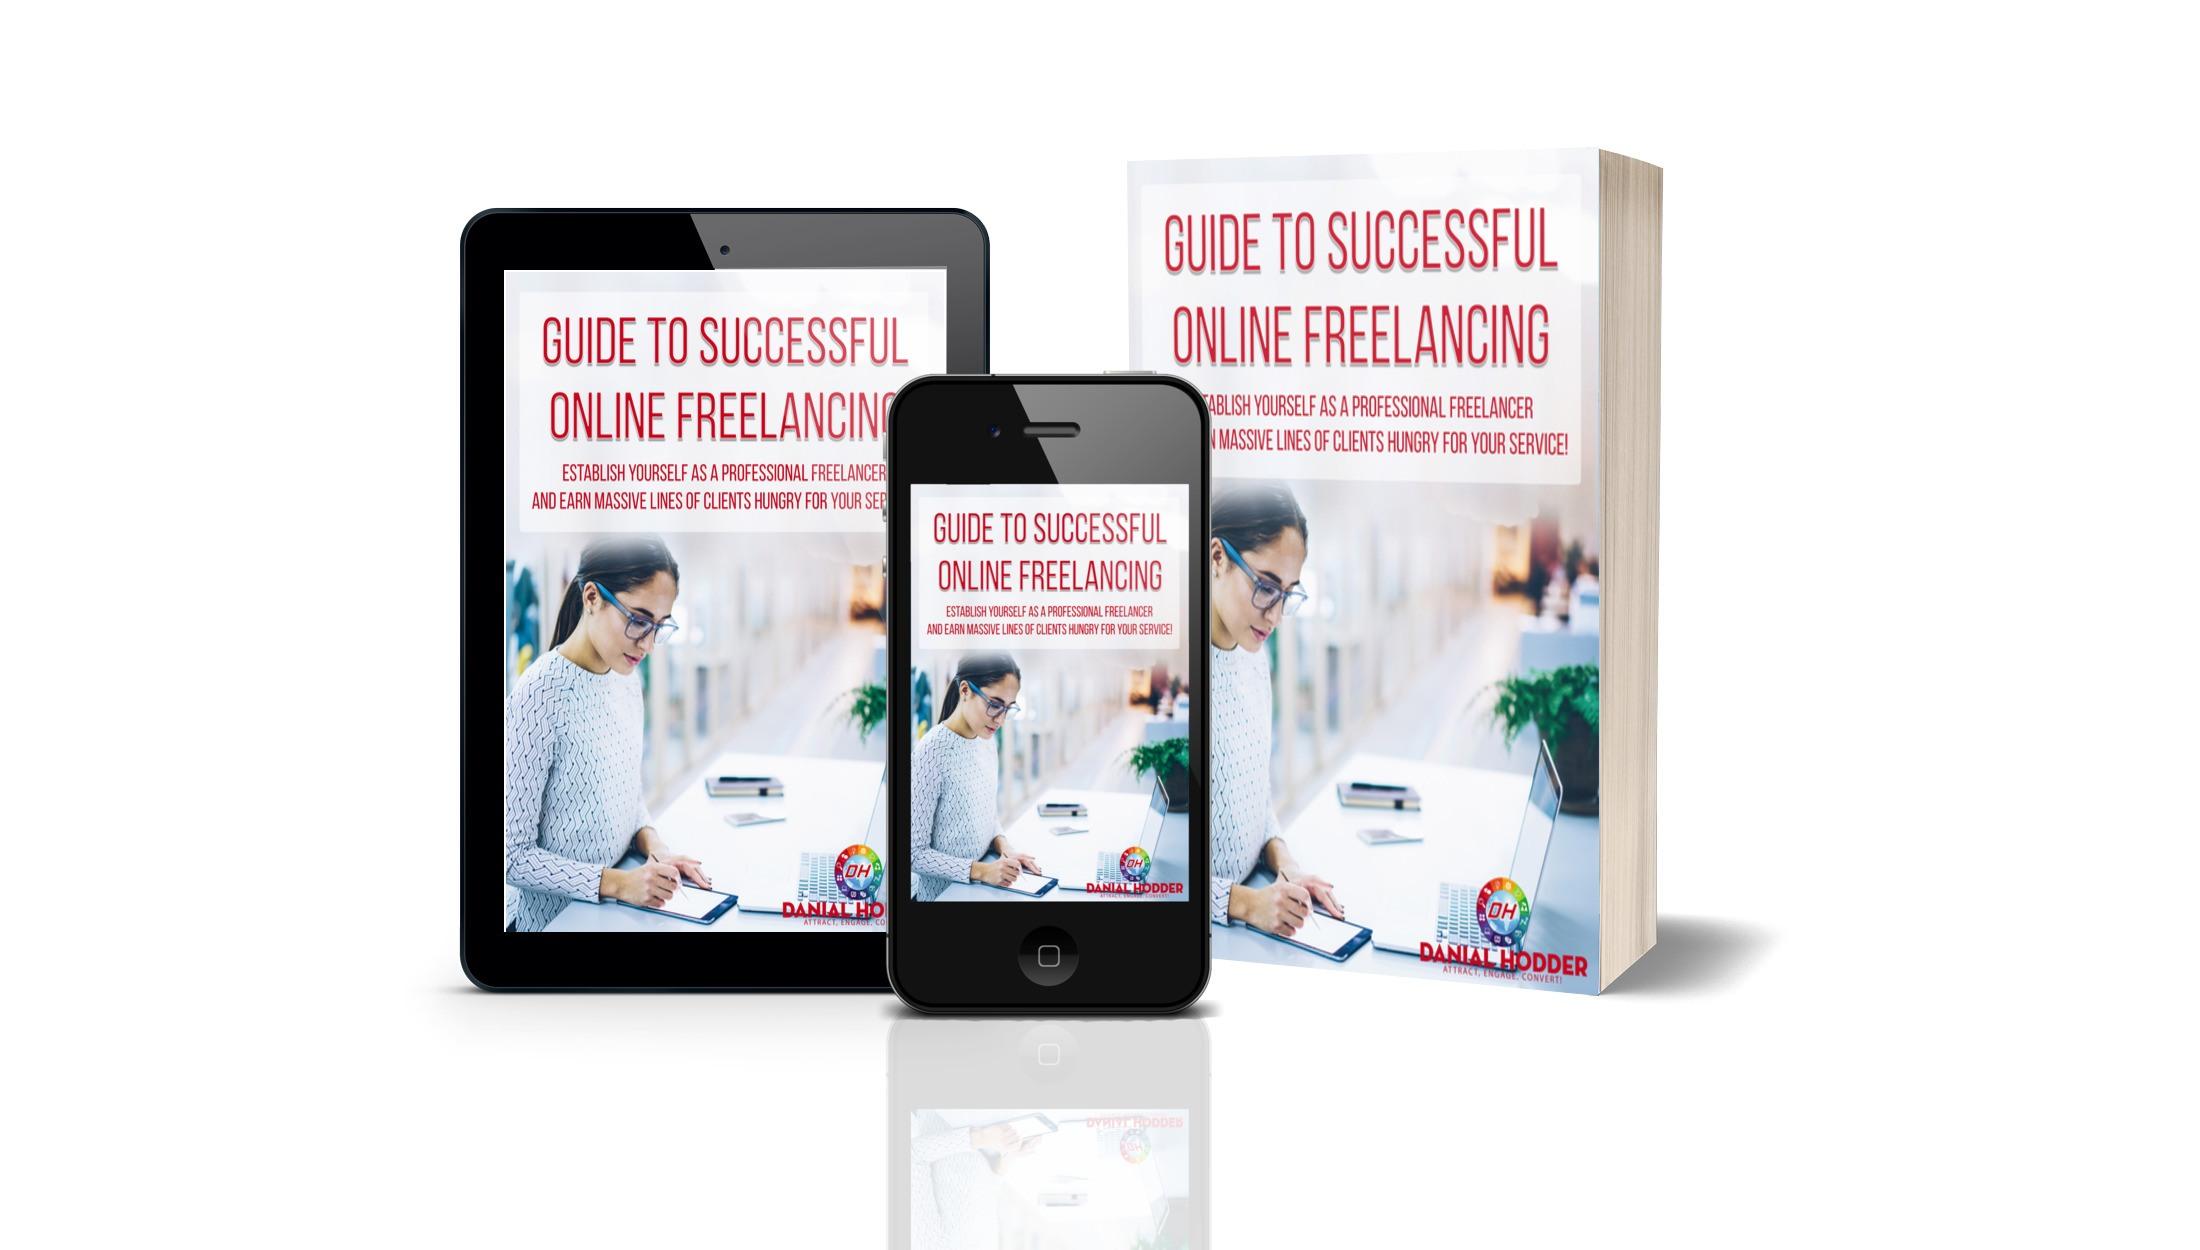 Danial Hodder successful online freelancing